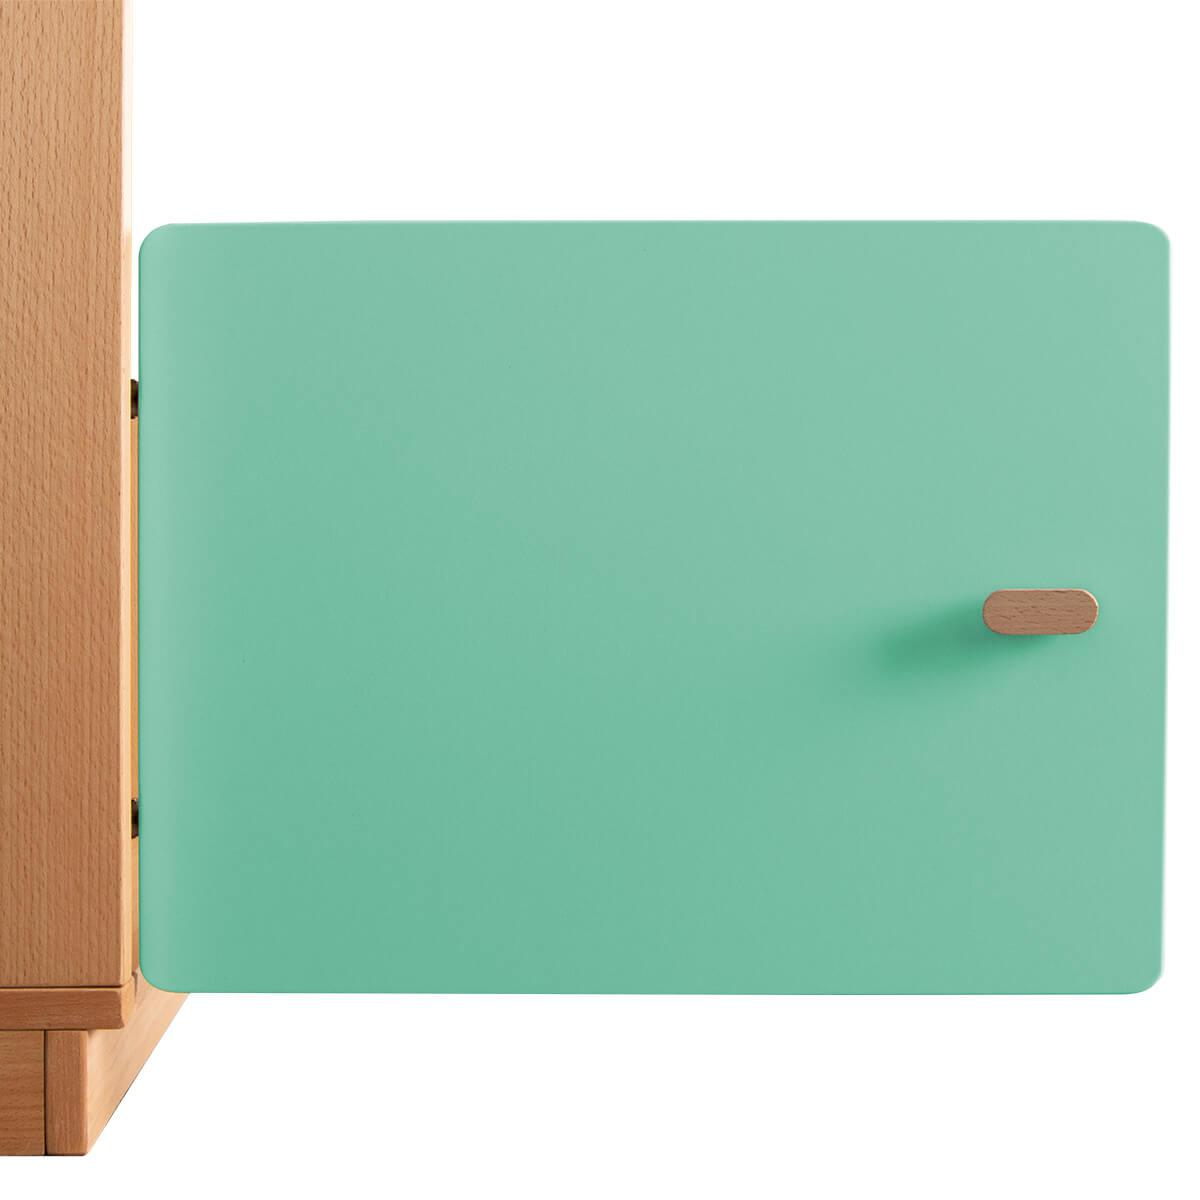 Schranktür 1/5 35cm-Griff DESTYLE de Breuyn MDF grün-lackiert